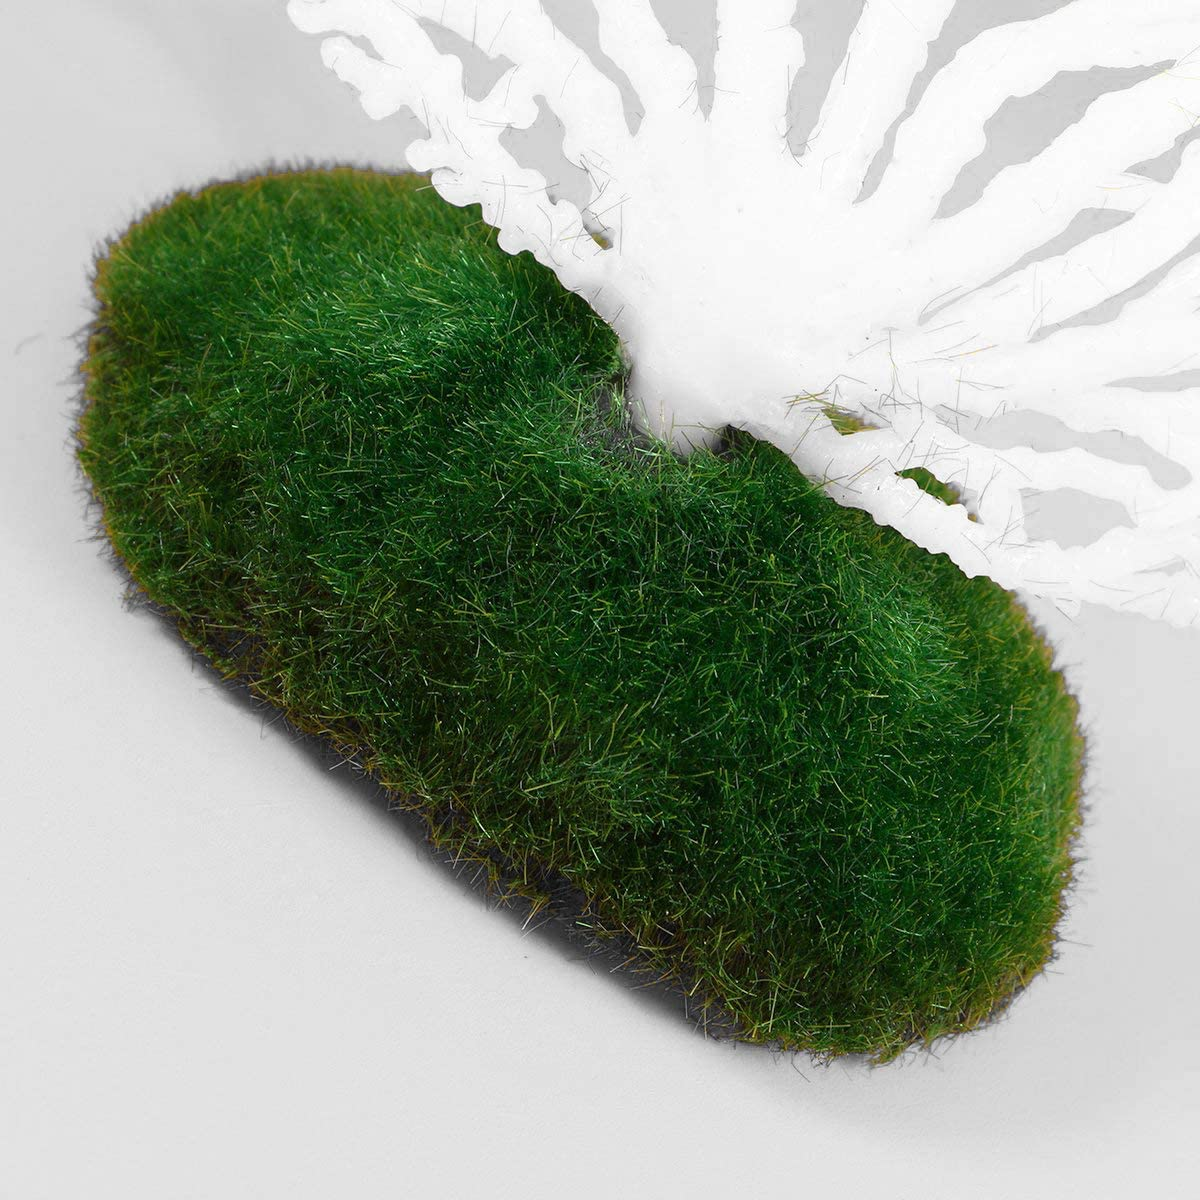 Green COMOK Aquarium Decortion Lifelike Rubber Fake Coral Ornament with a Resin Base for Aquariums Fish Tank Decoration